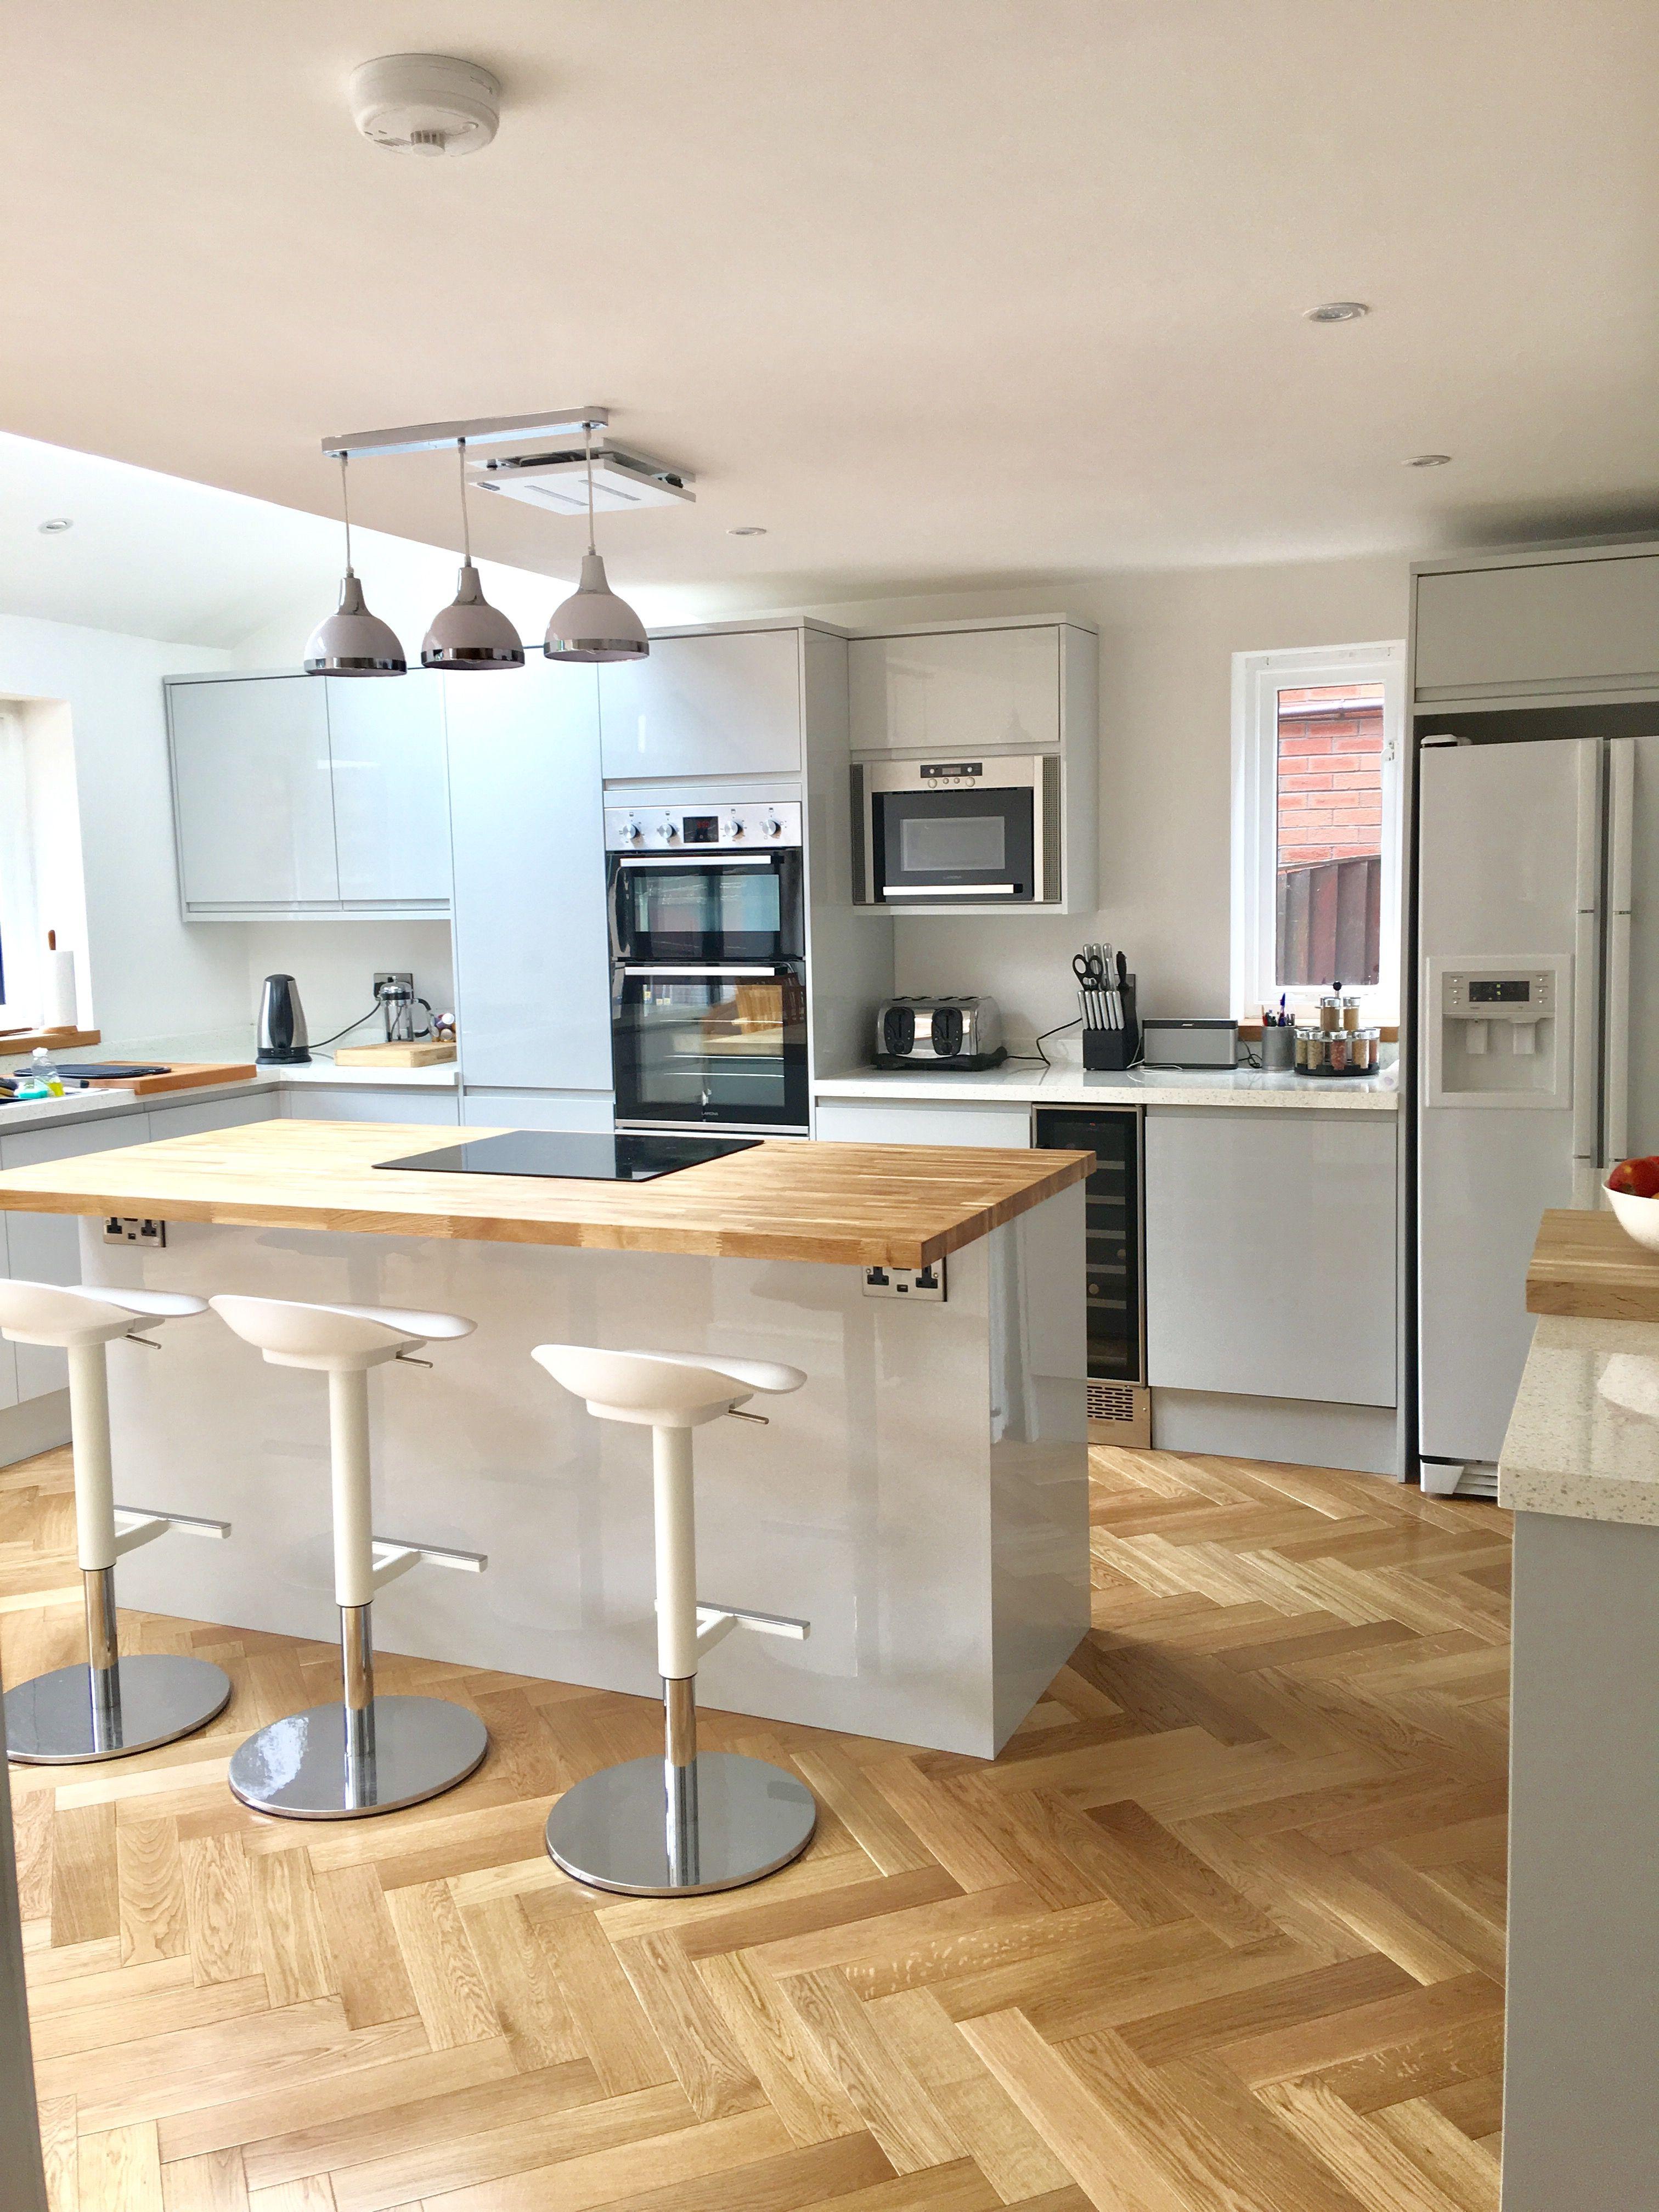 Chertwell Dove grey gloss Howdens Farmhouse kitchen